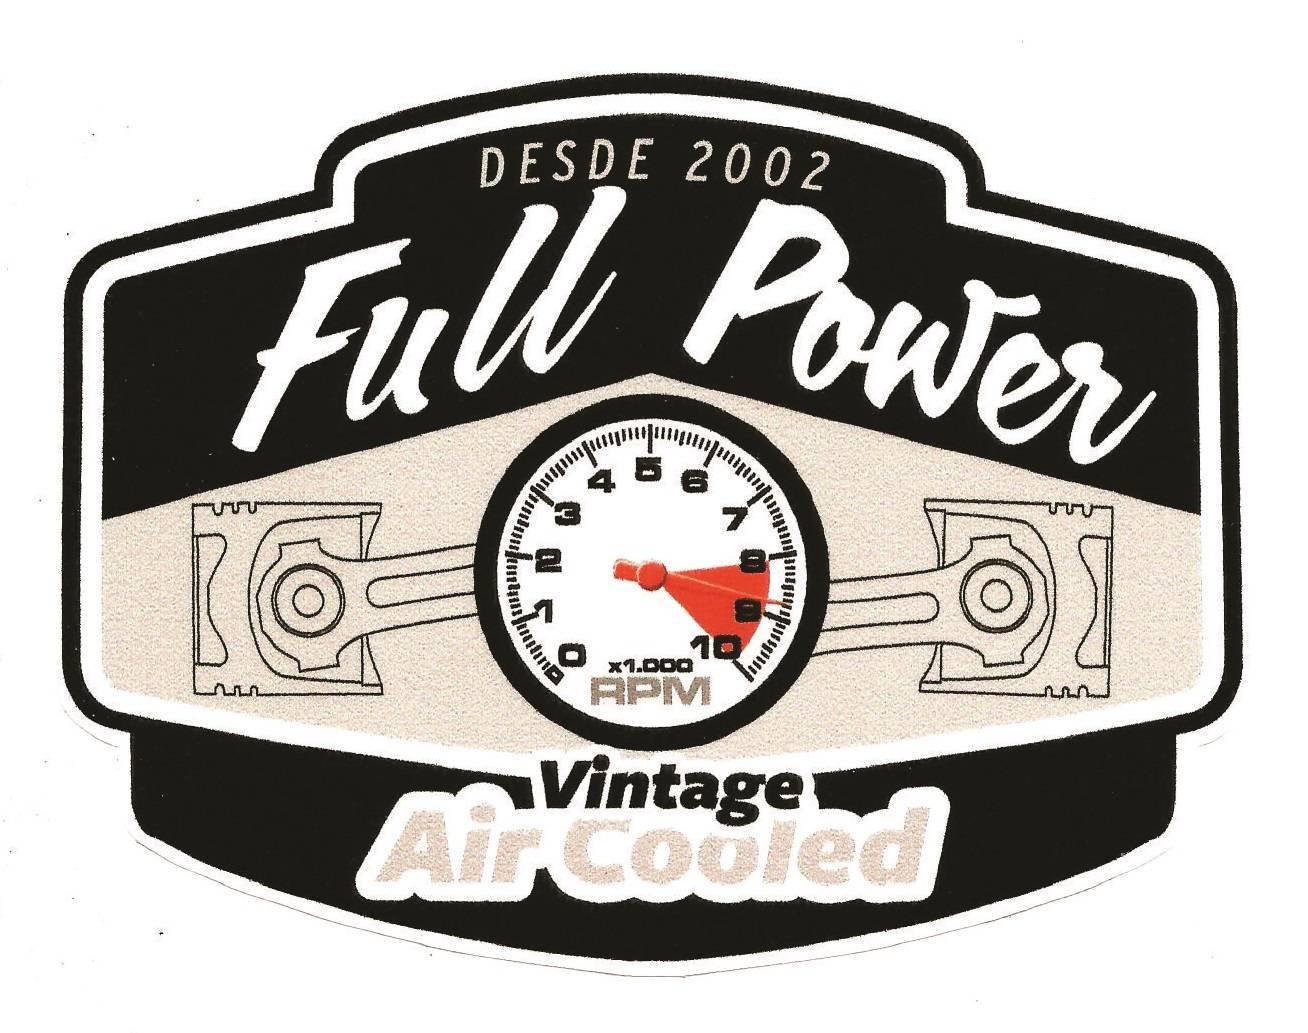 Adesivo Fullpower Contagiros Cinza - Loja FullPower